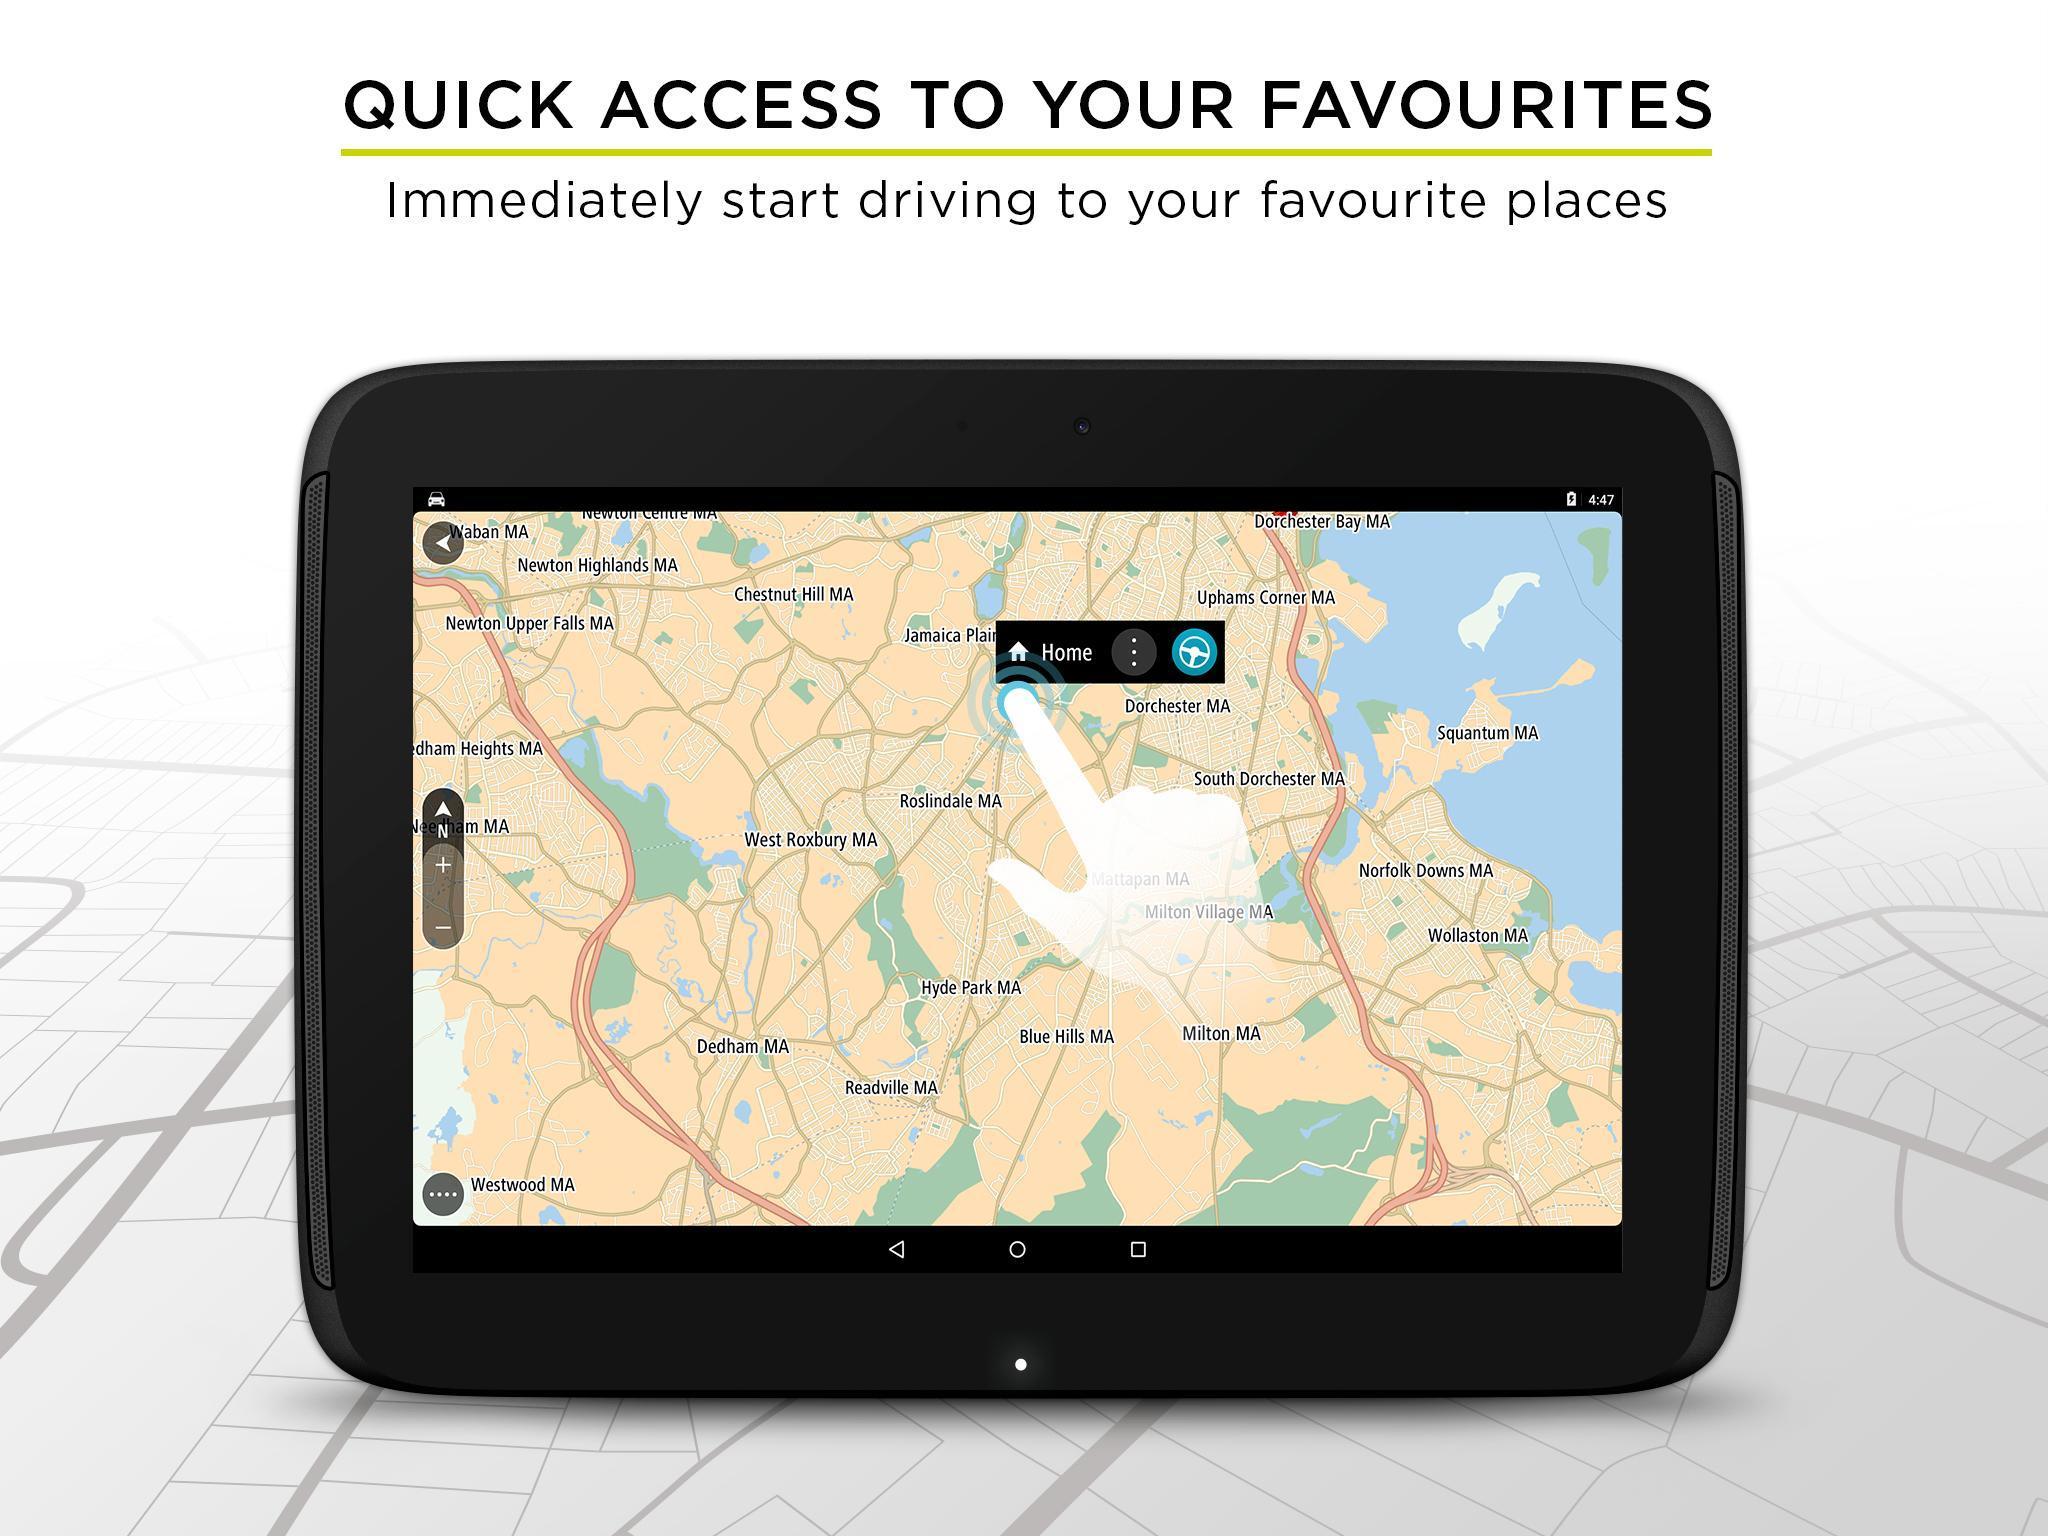 TomTom GPS Navigation - Live Traffic Alerts & Maps 2.0.4 Screenshot 10